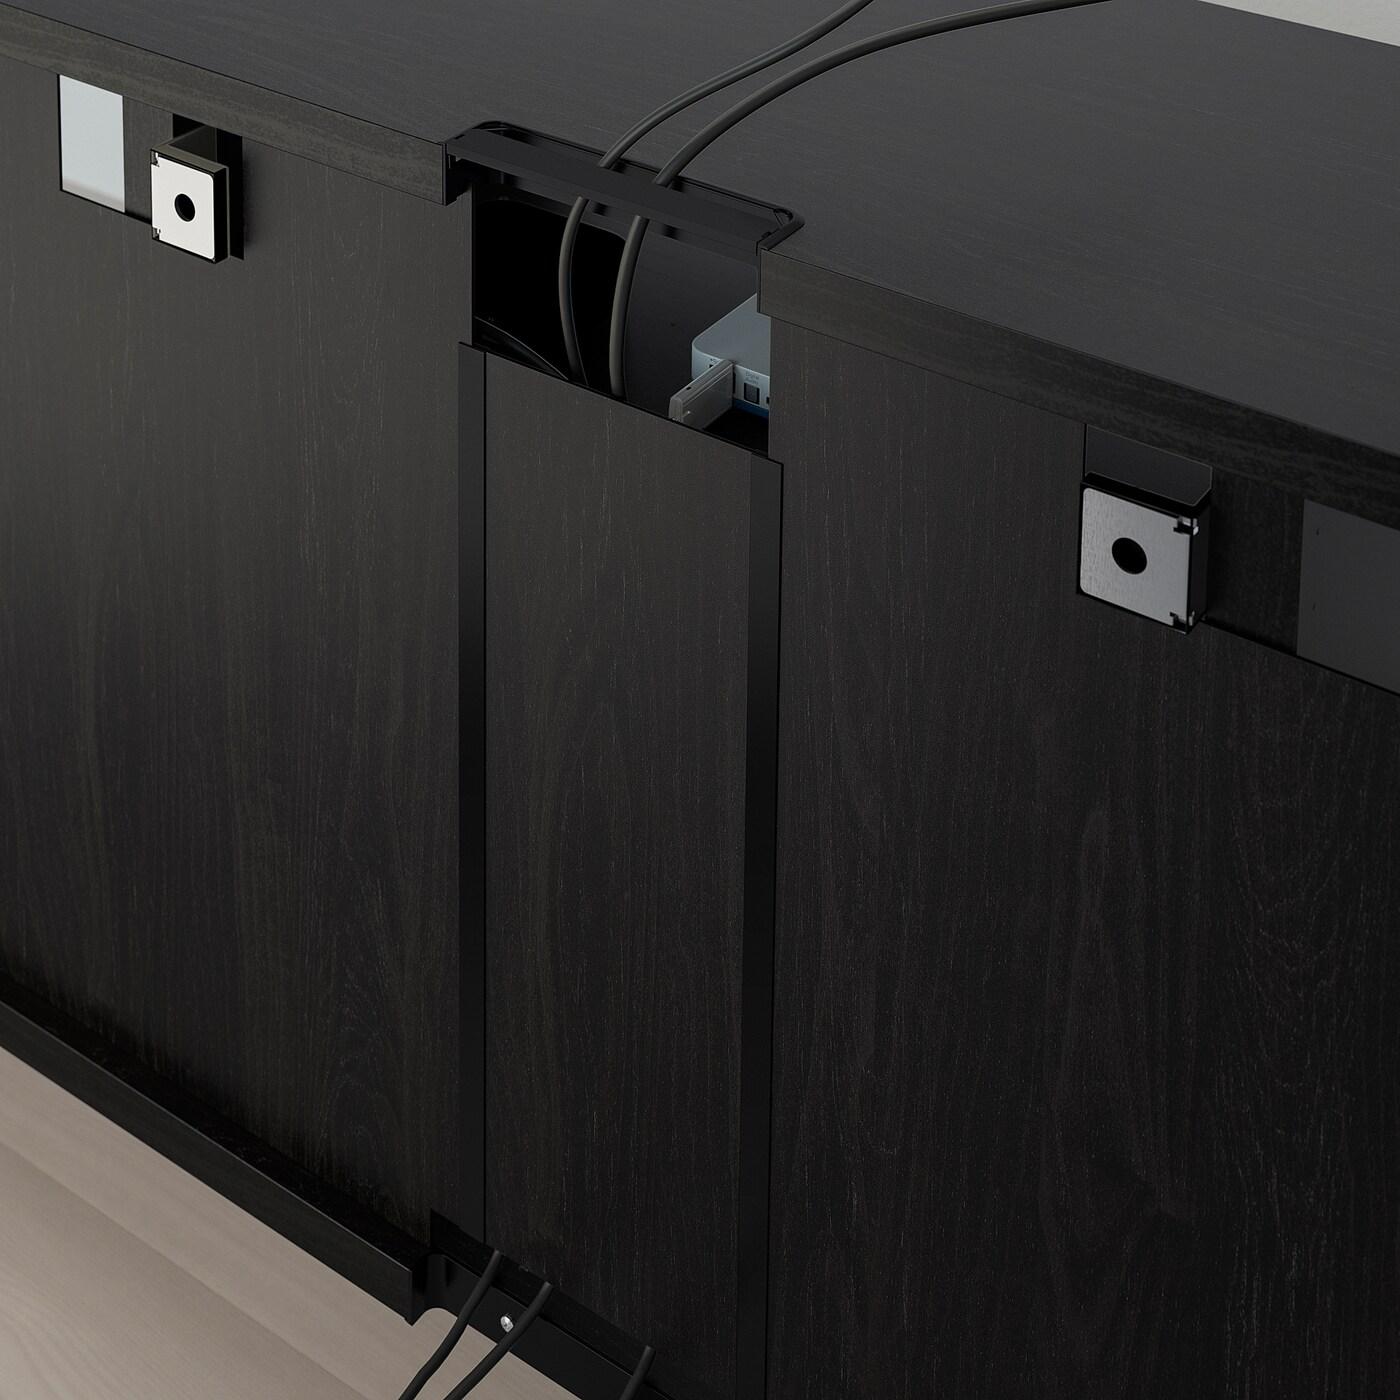 besta banc tv brun noir 180x40x64 cm